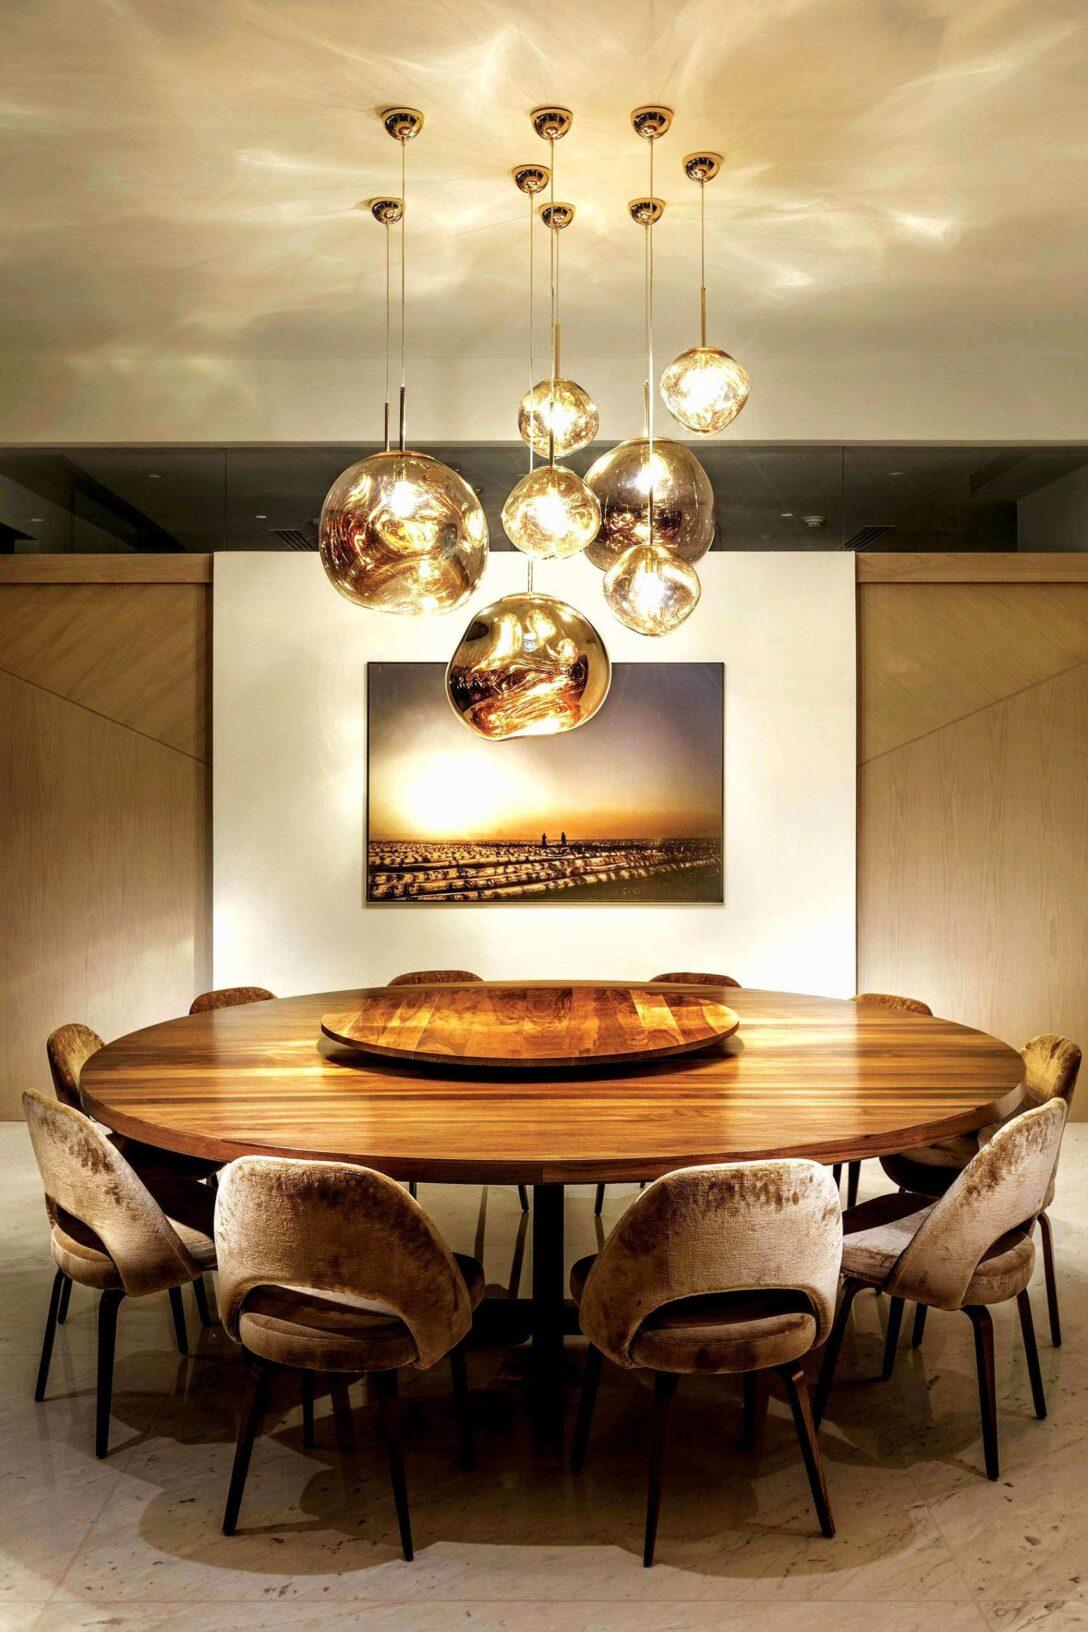 Large Size of 59 Genial Led Lampen Wohnzimmer Luxus Tolles Ideen Vinylboden Büffelleder Sofa Anbauwand Hängeleuchte Sessel Bad Moderne Deckenleuchte Deckenlampe Wohnzimmer Wohnzimmer Led Lampe